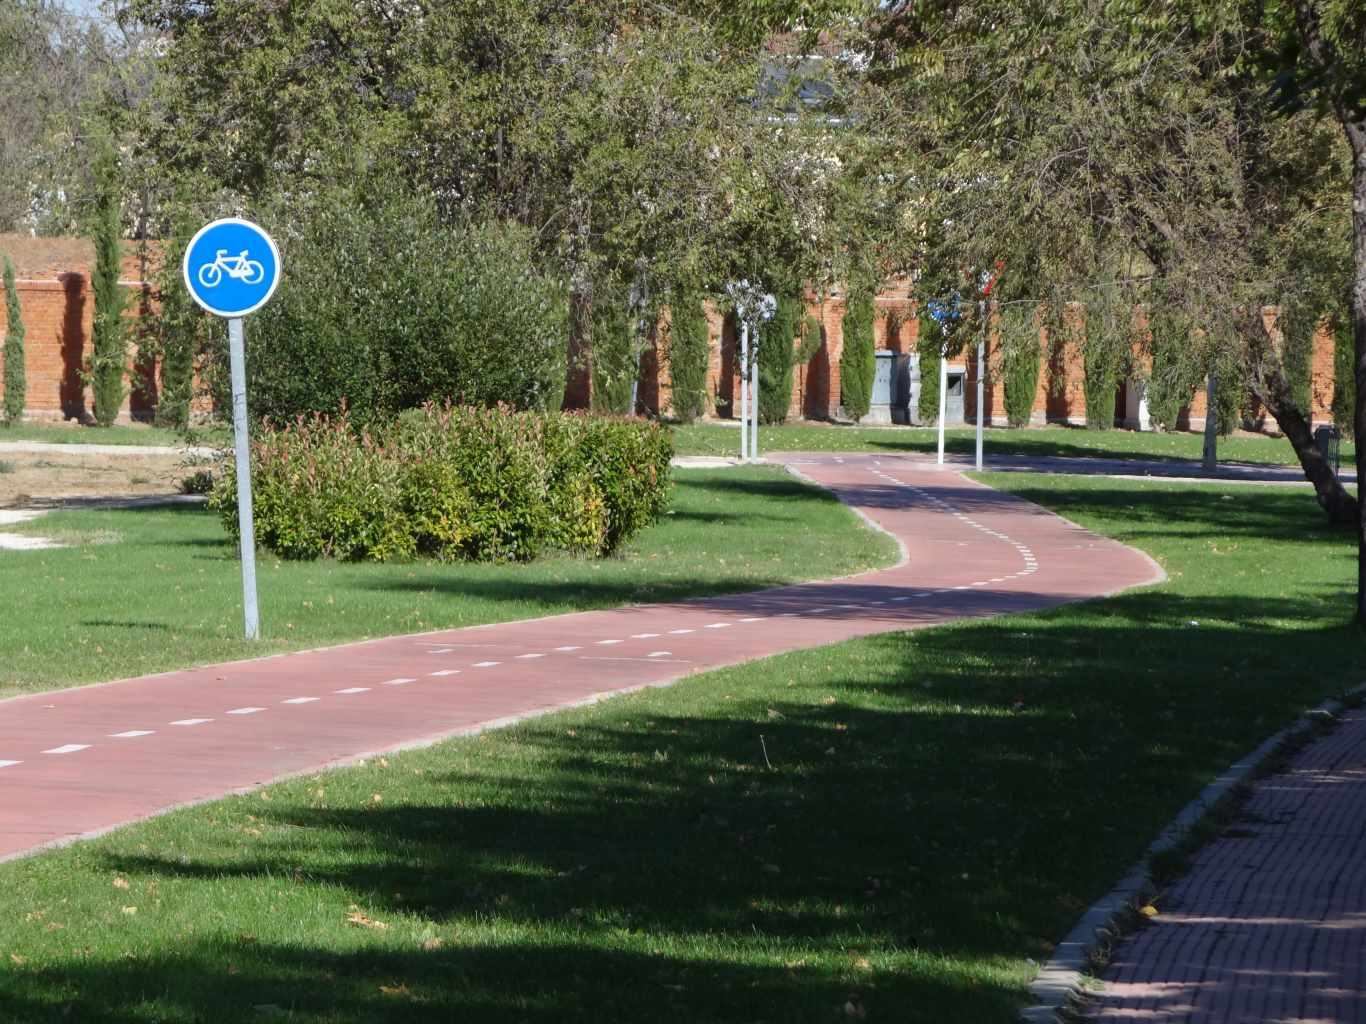 Carril Bici de Alcalá de Henares (6)